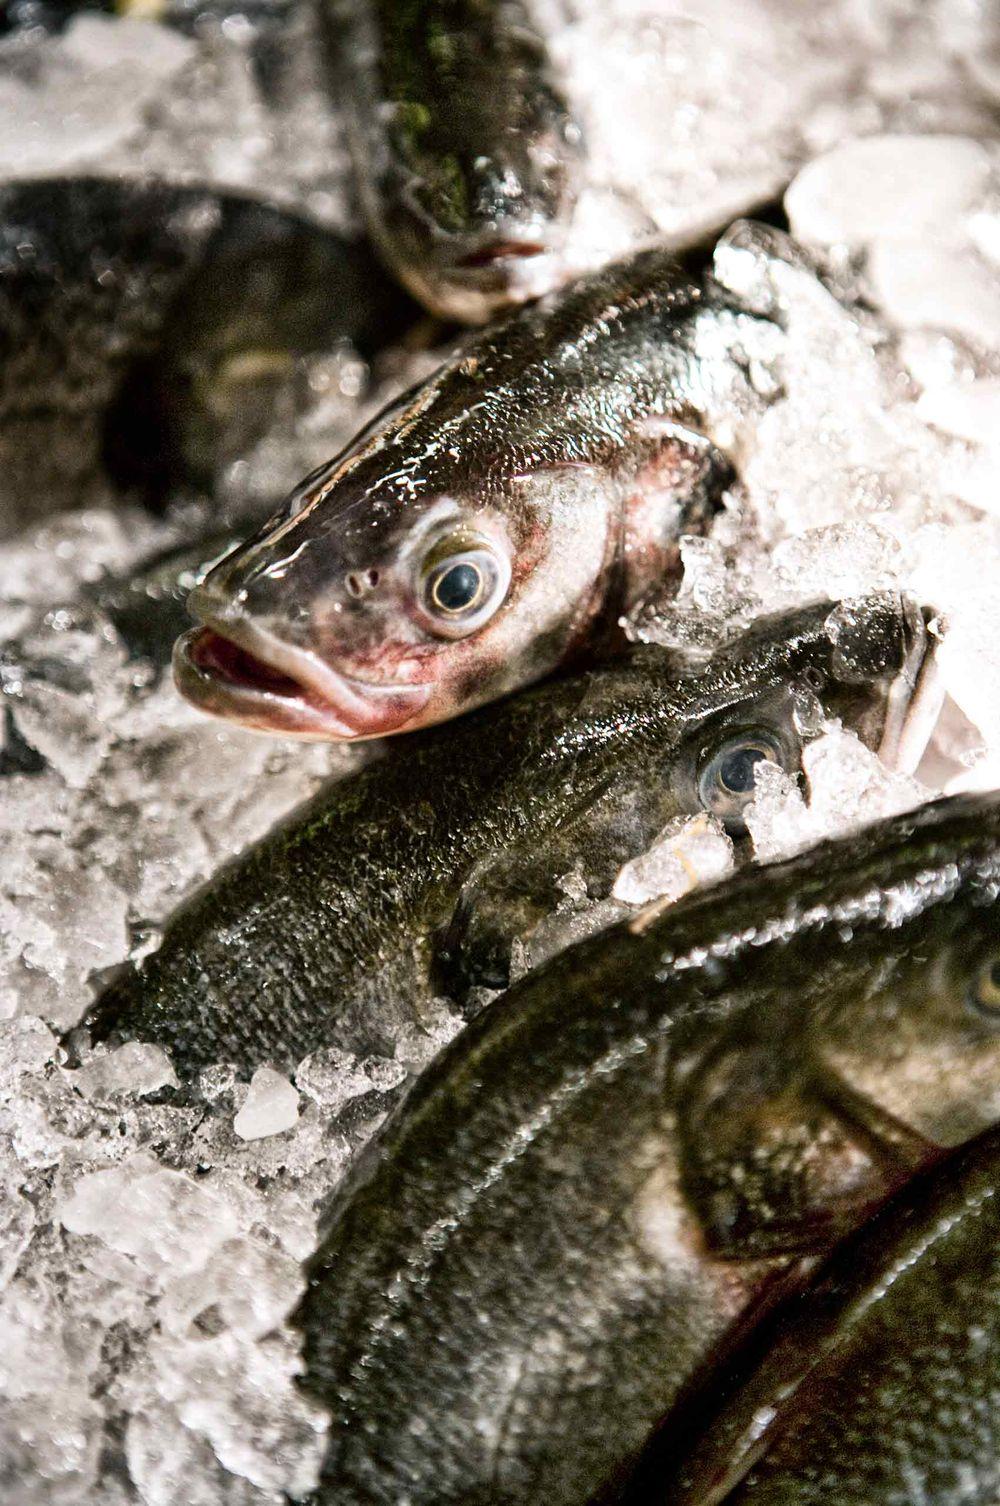 Fish-StillLife-RealLife-color-by-HenrikOlundPhotography.jpg